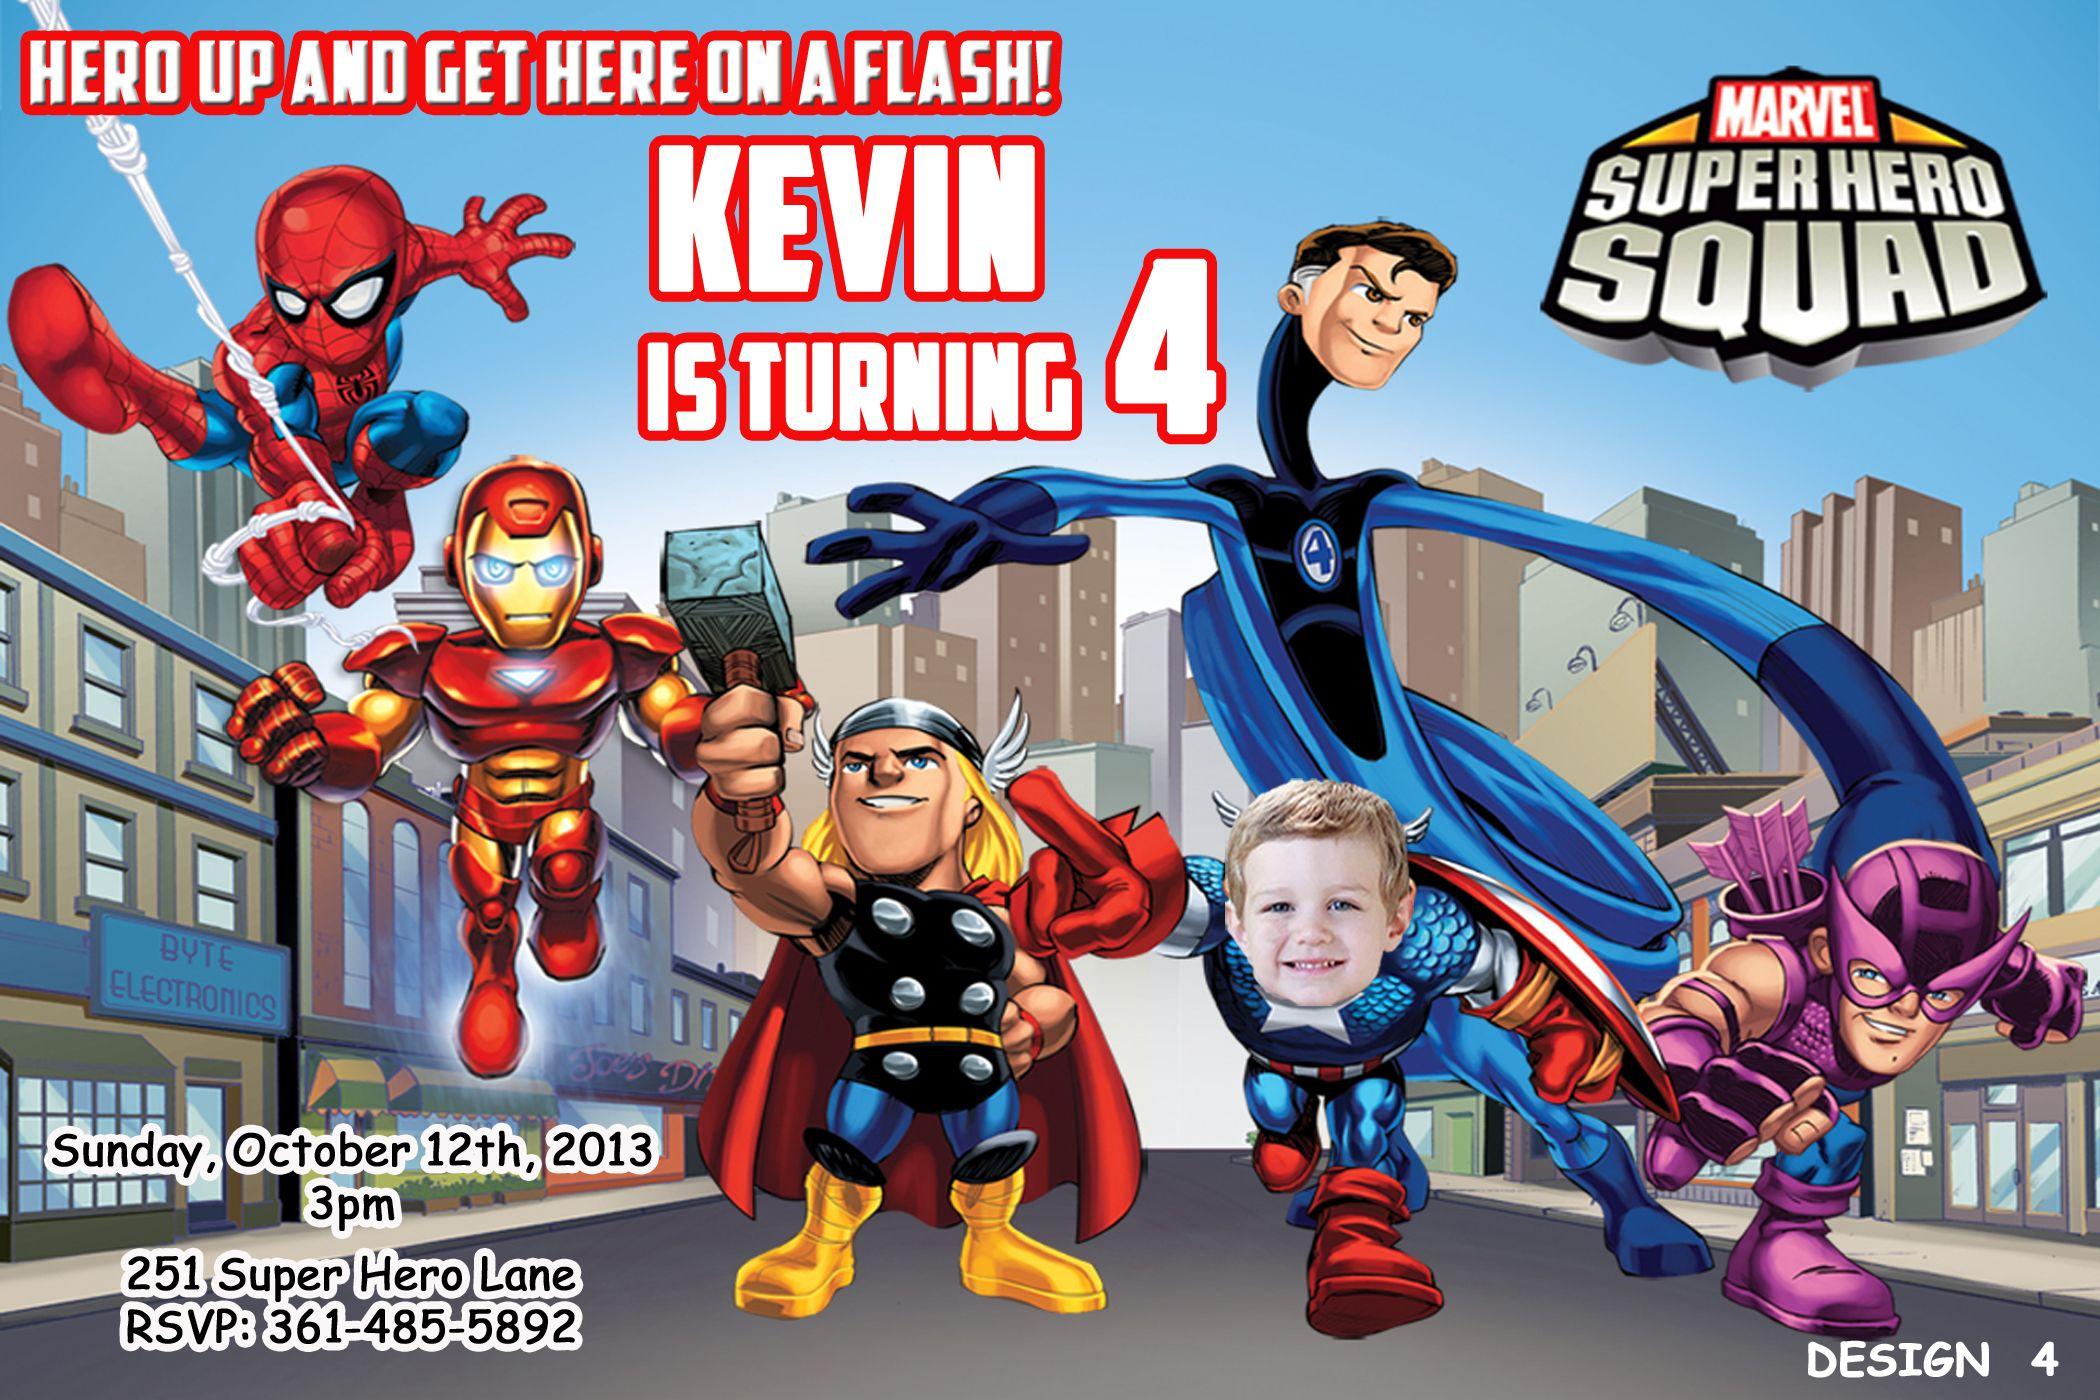 Super Heroes Squad Birthday Invitation $8.99 | Marvel Super Heroes ...